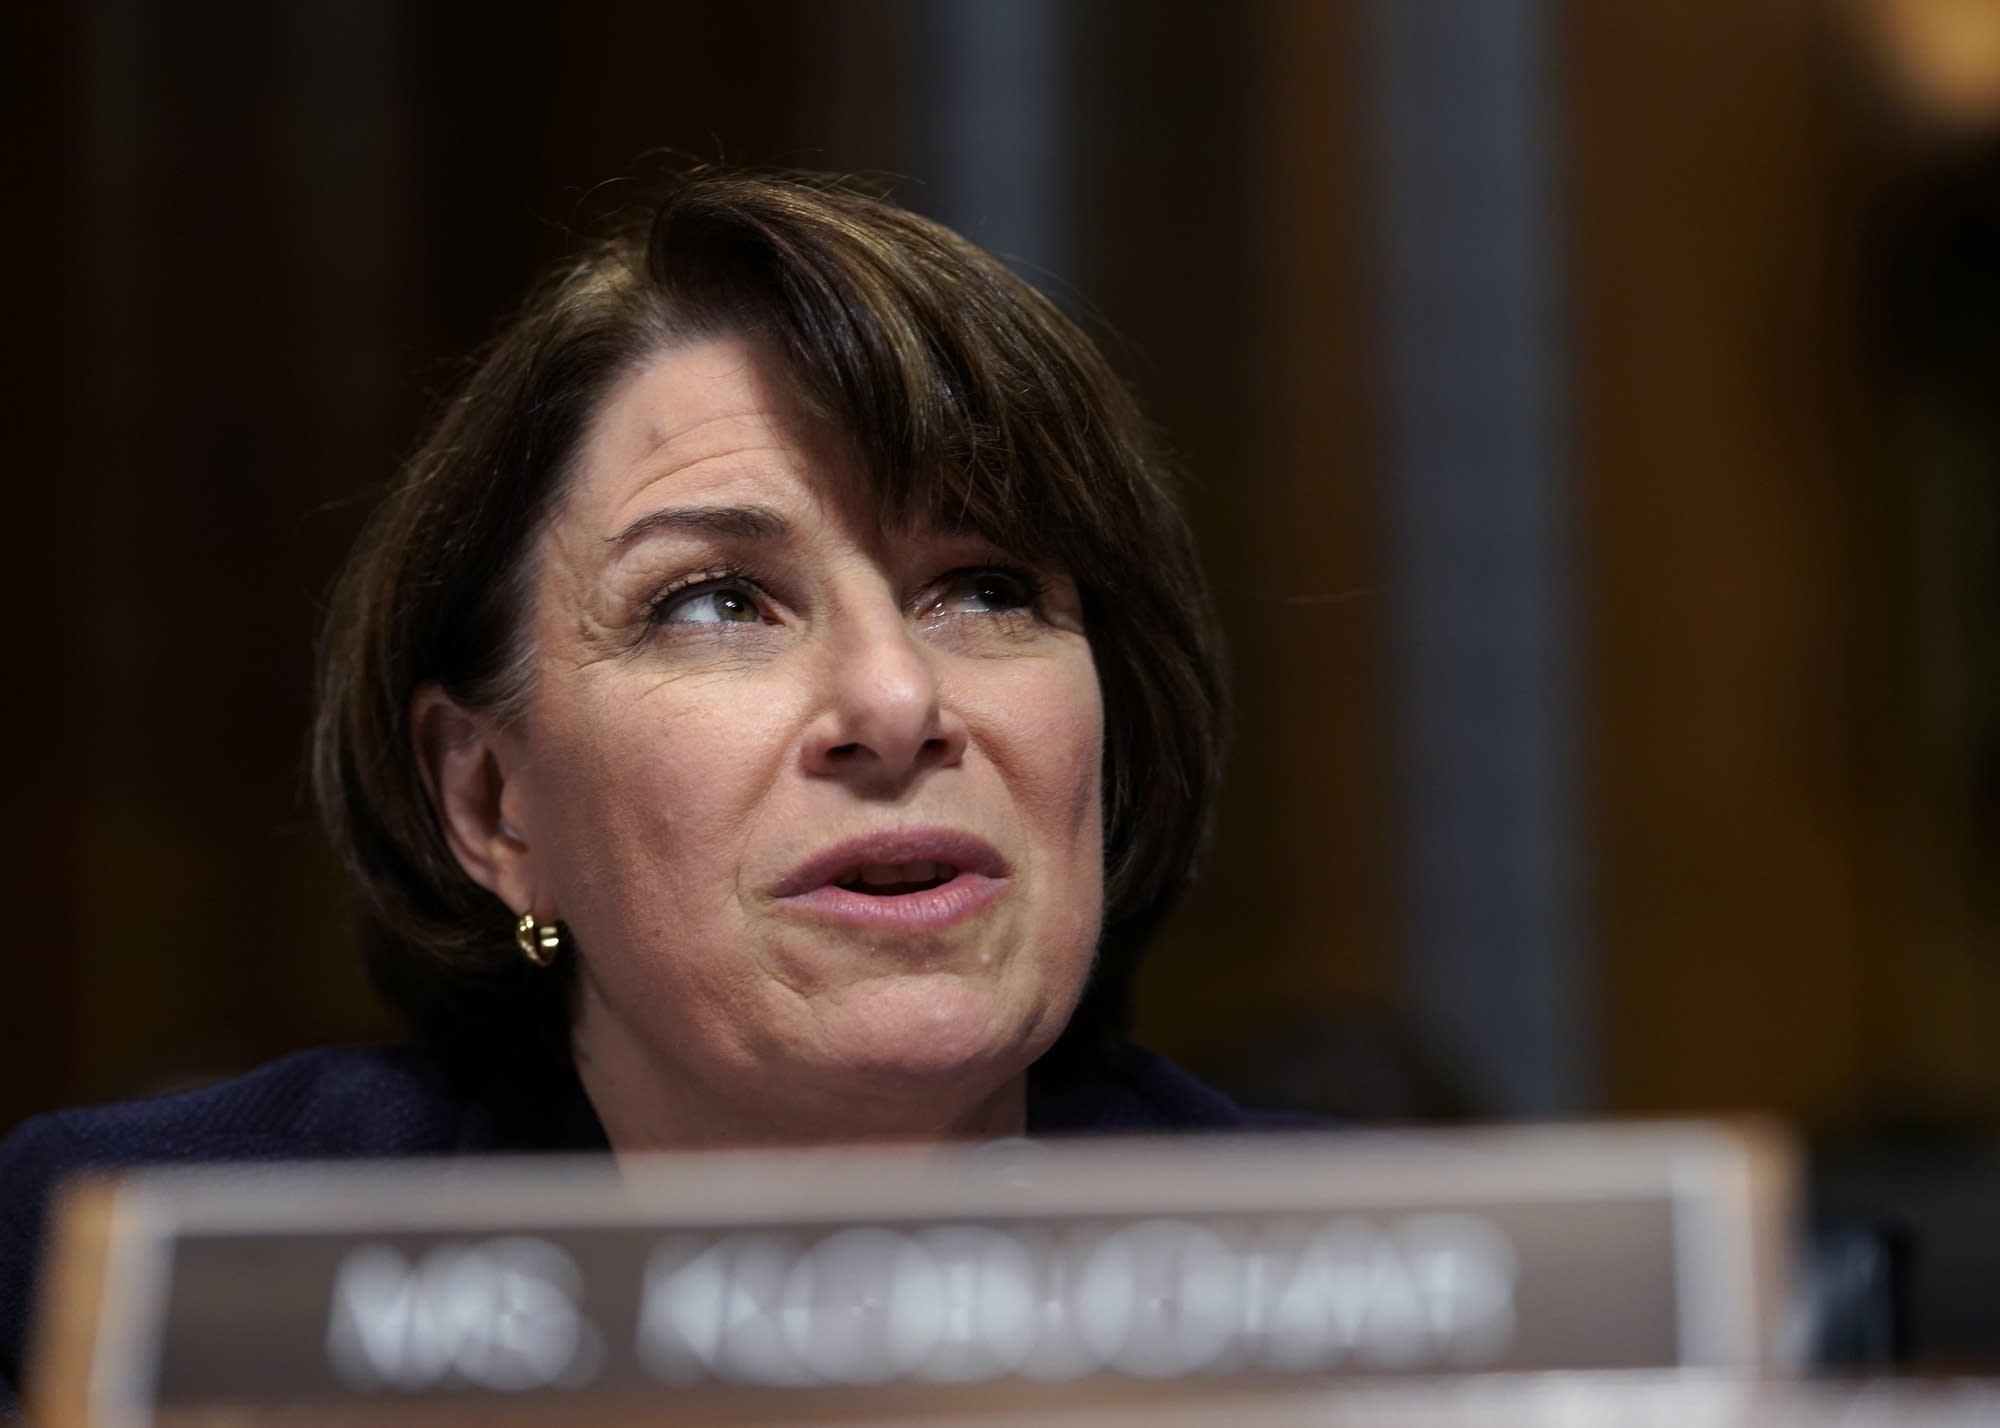 Sen. Amy Klobuchar questioned Supreme Court nominee Brett Kavanaugh.